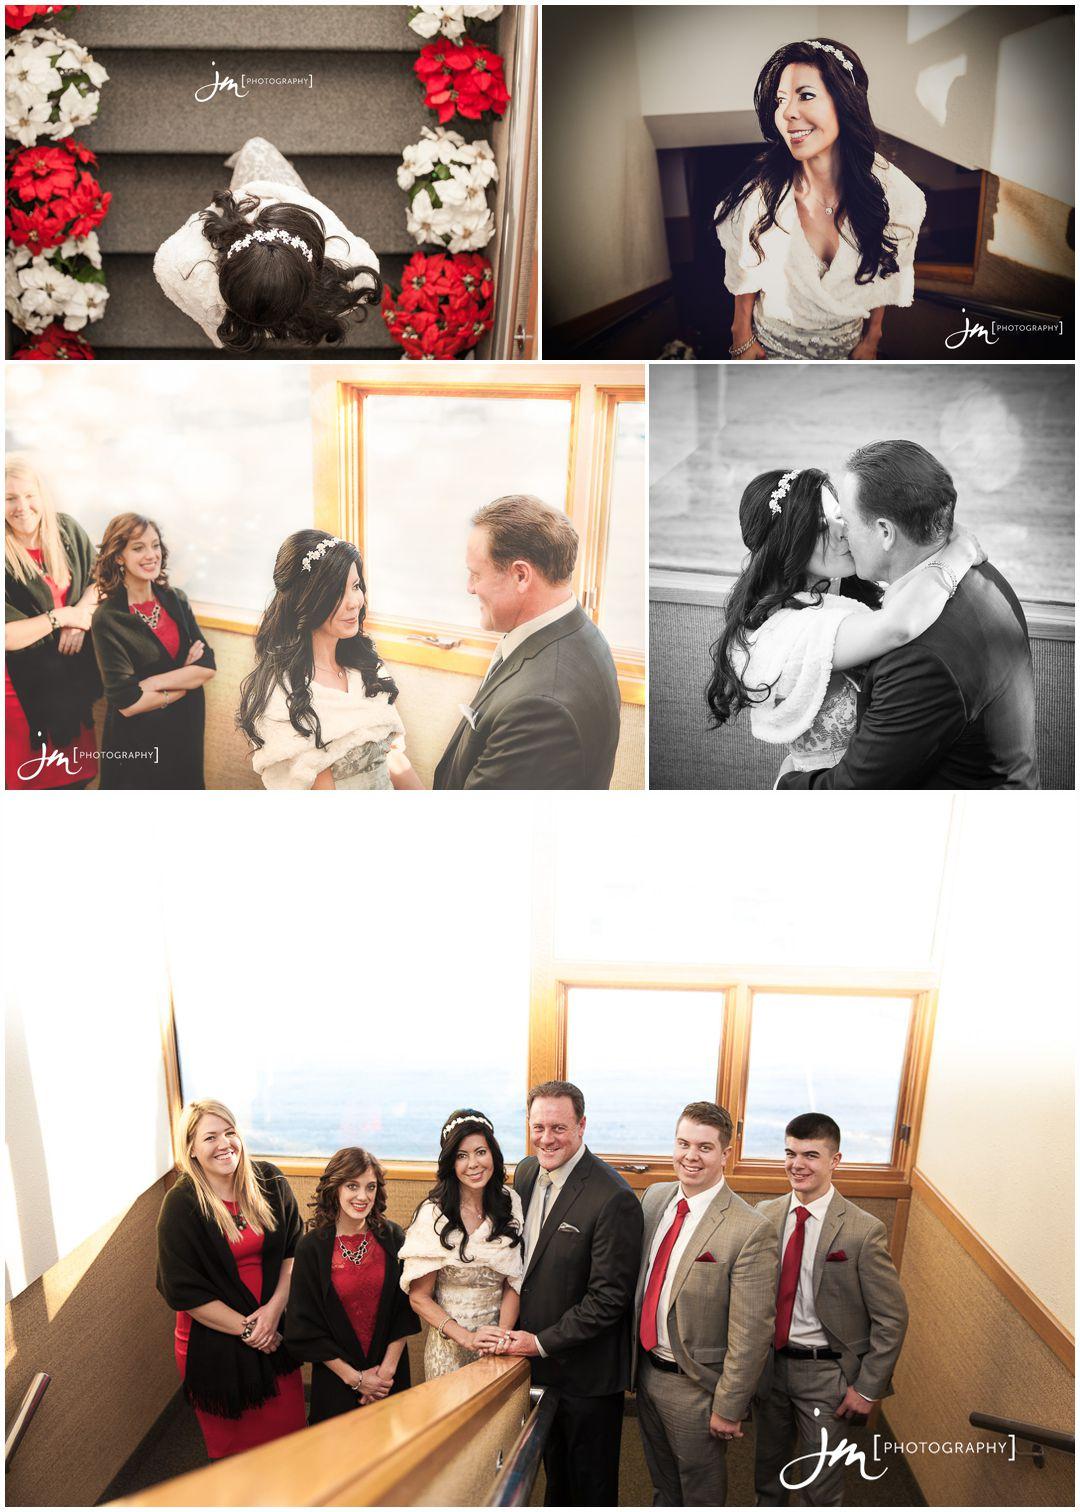 151229_3004-Calgary-Wedding-Photographers-17th-Ave-Mormon-Chaple-JM_Photography